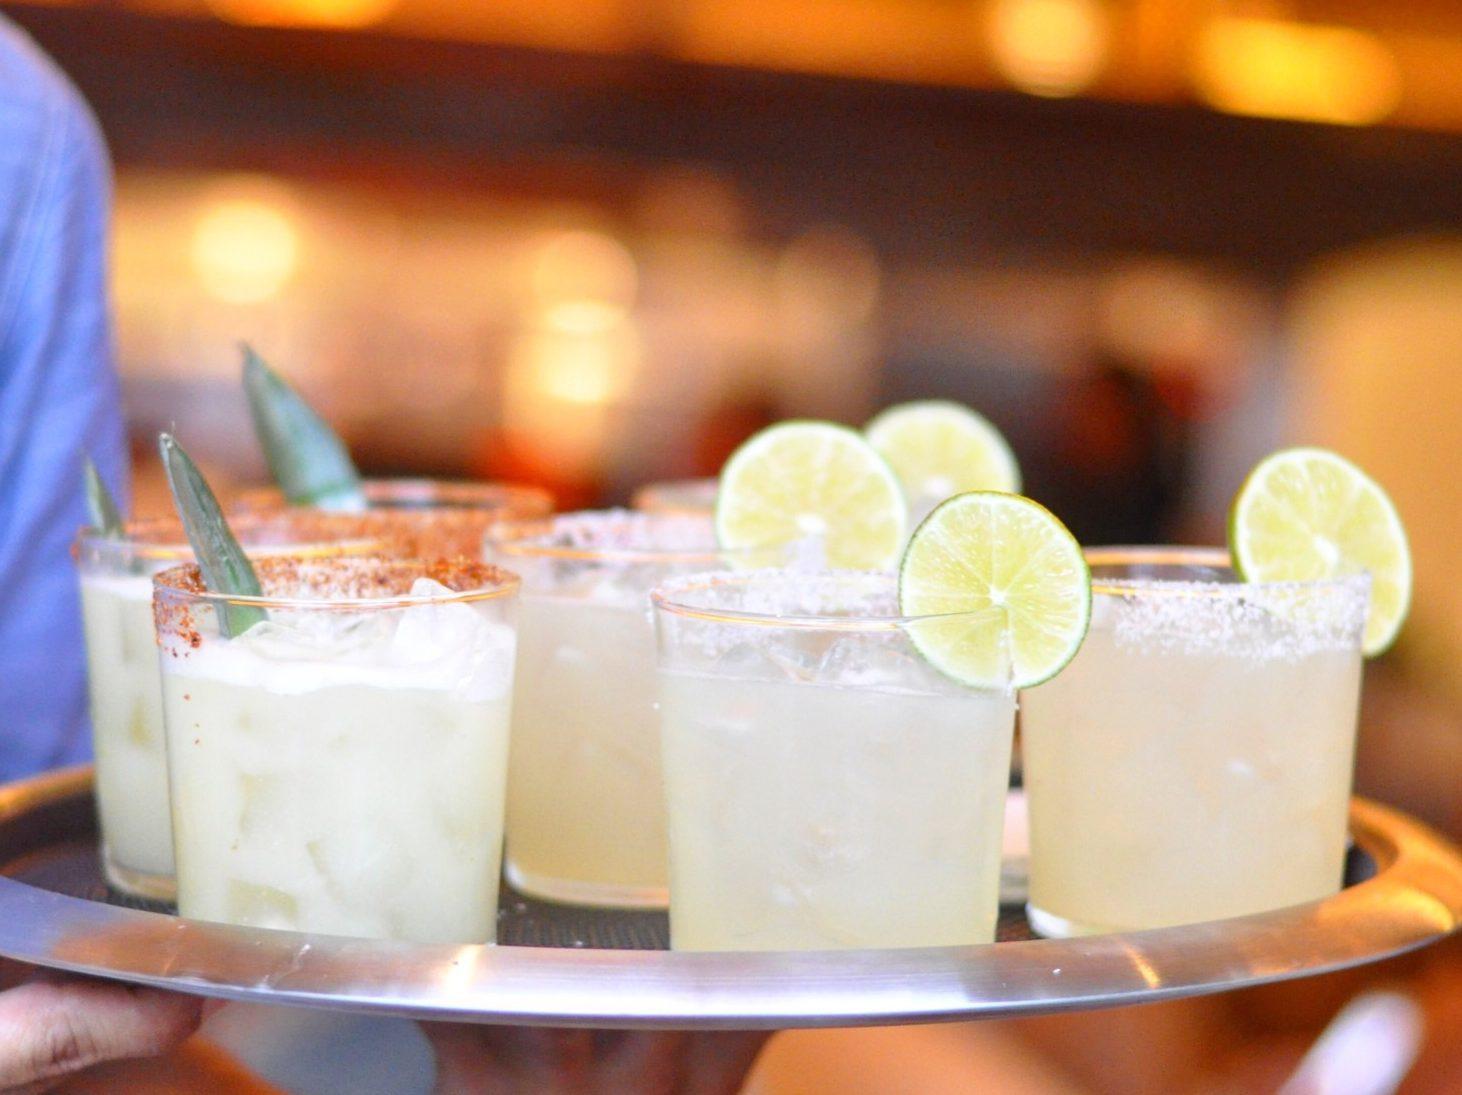 Tray of margaritas